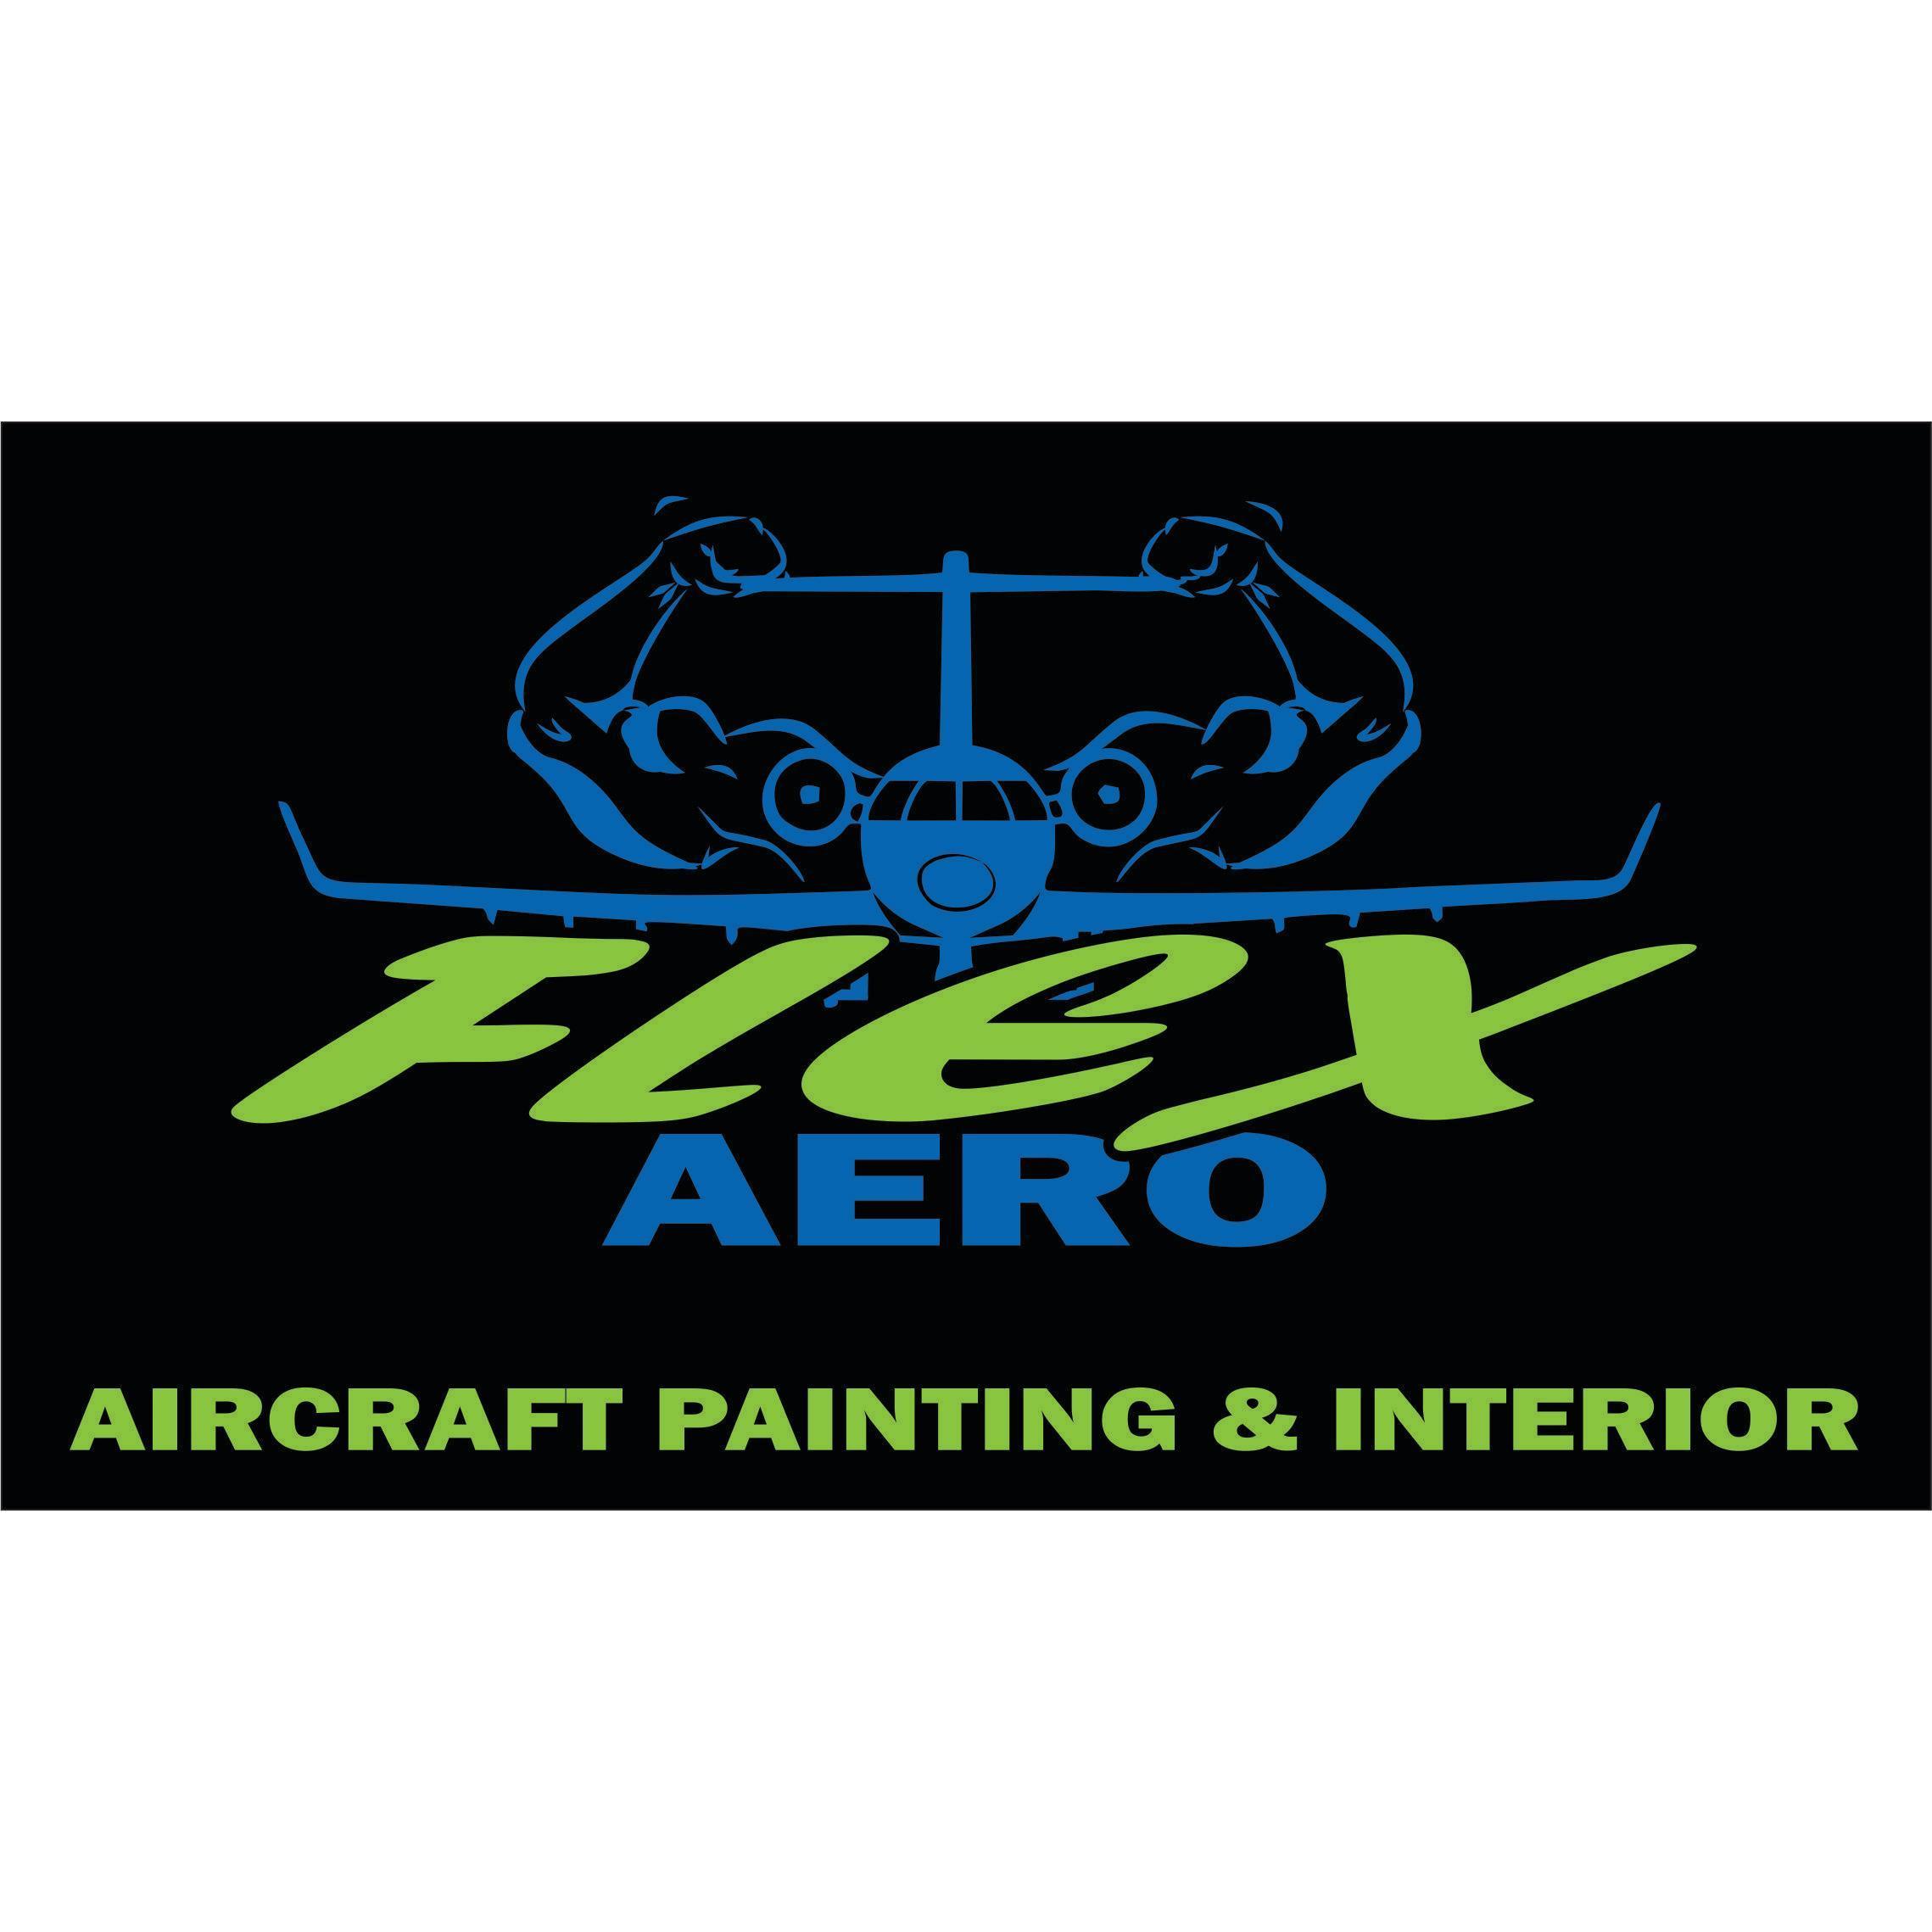 Flex Aero Aircraft Painting  and  Interior Refurbishment